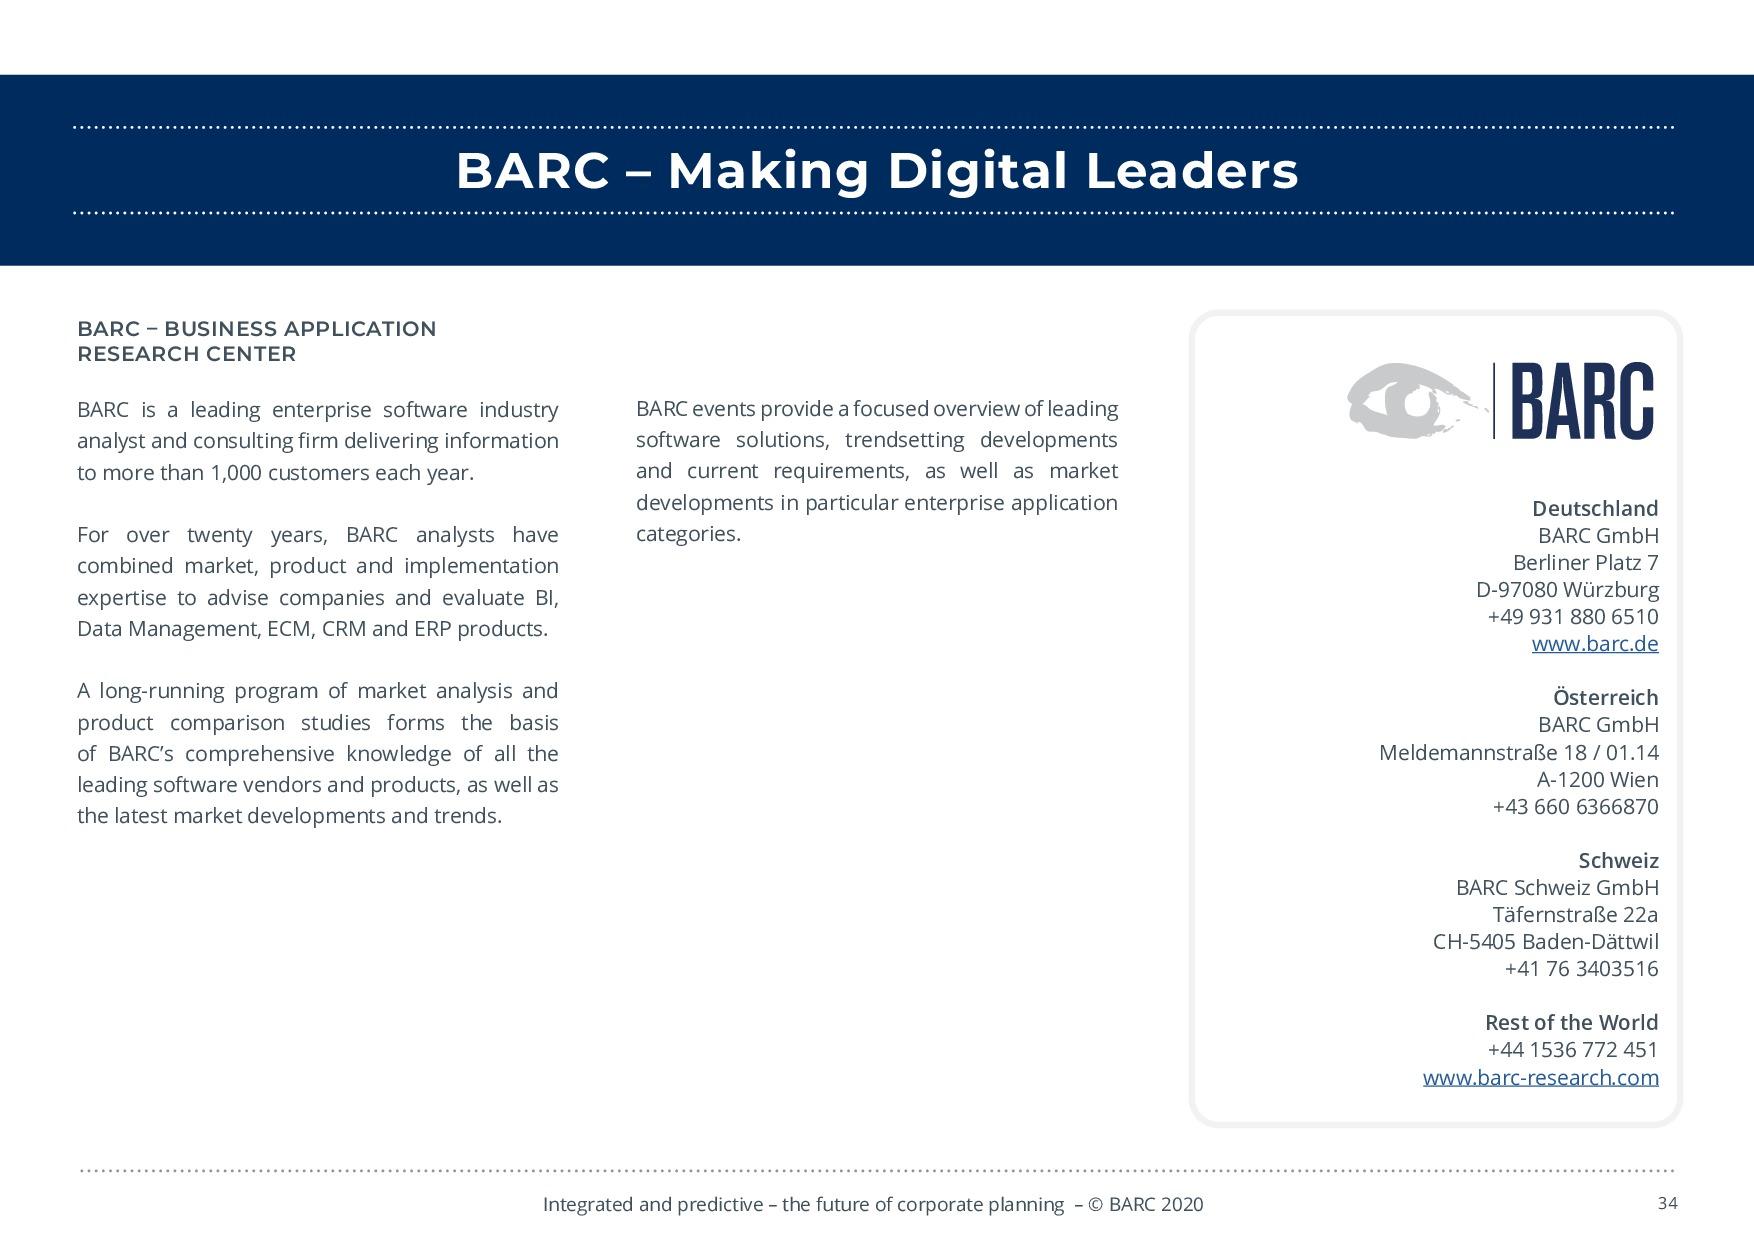 BARC – 統合と予測 – 経営計画の未来 | Page 34